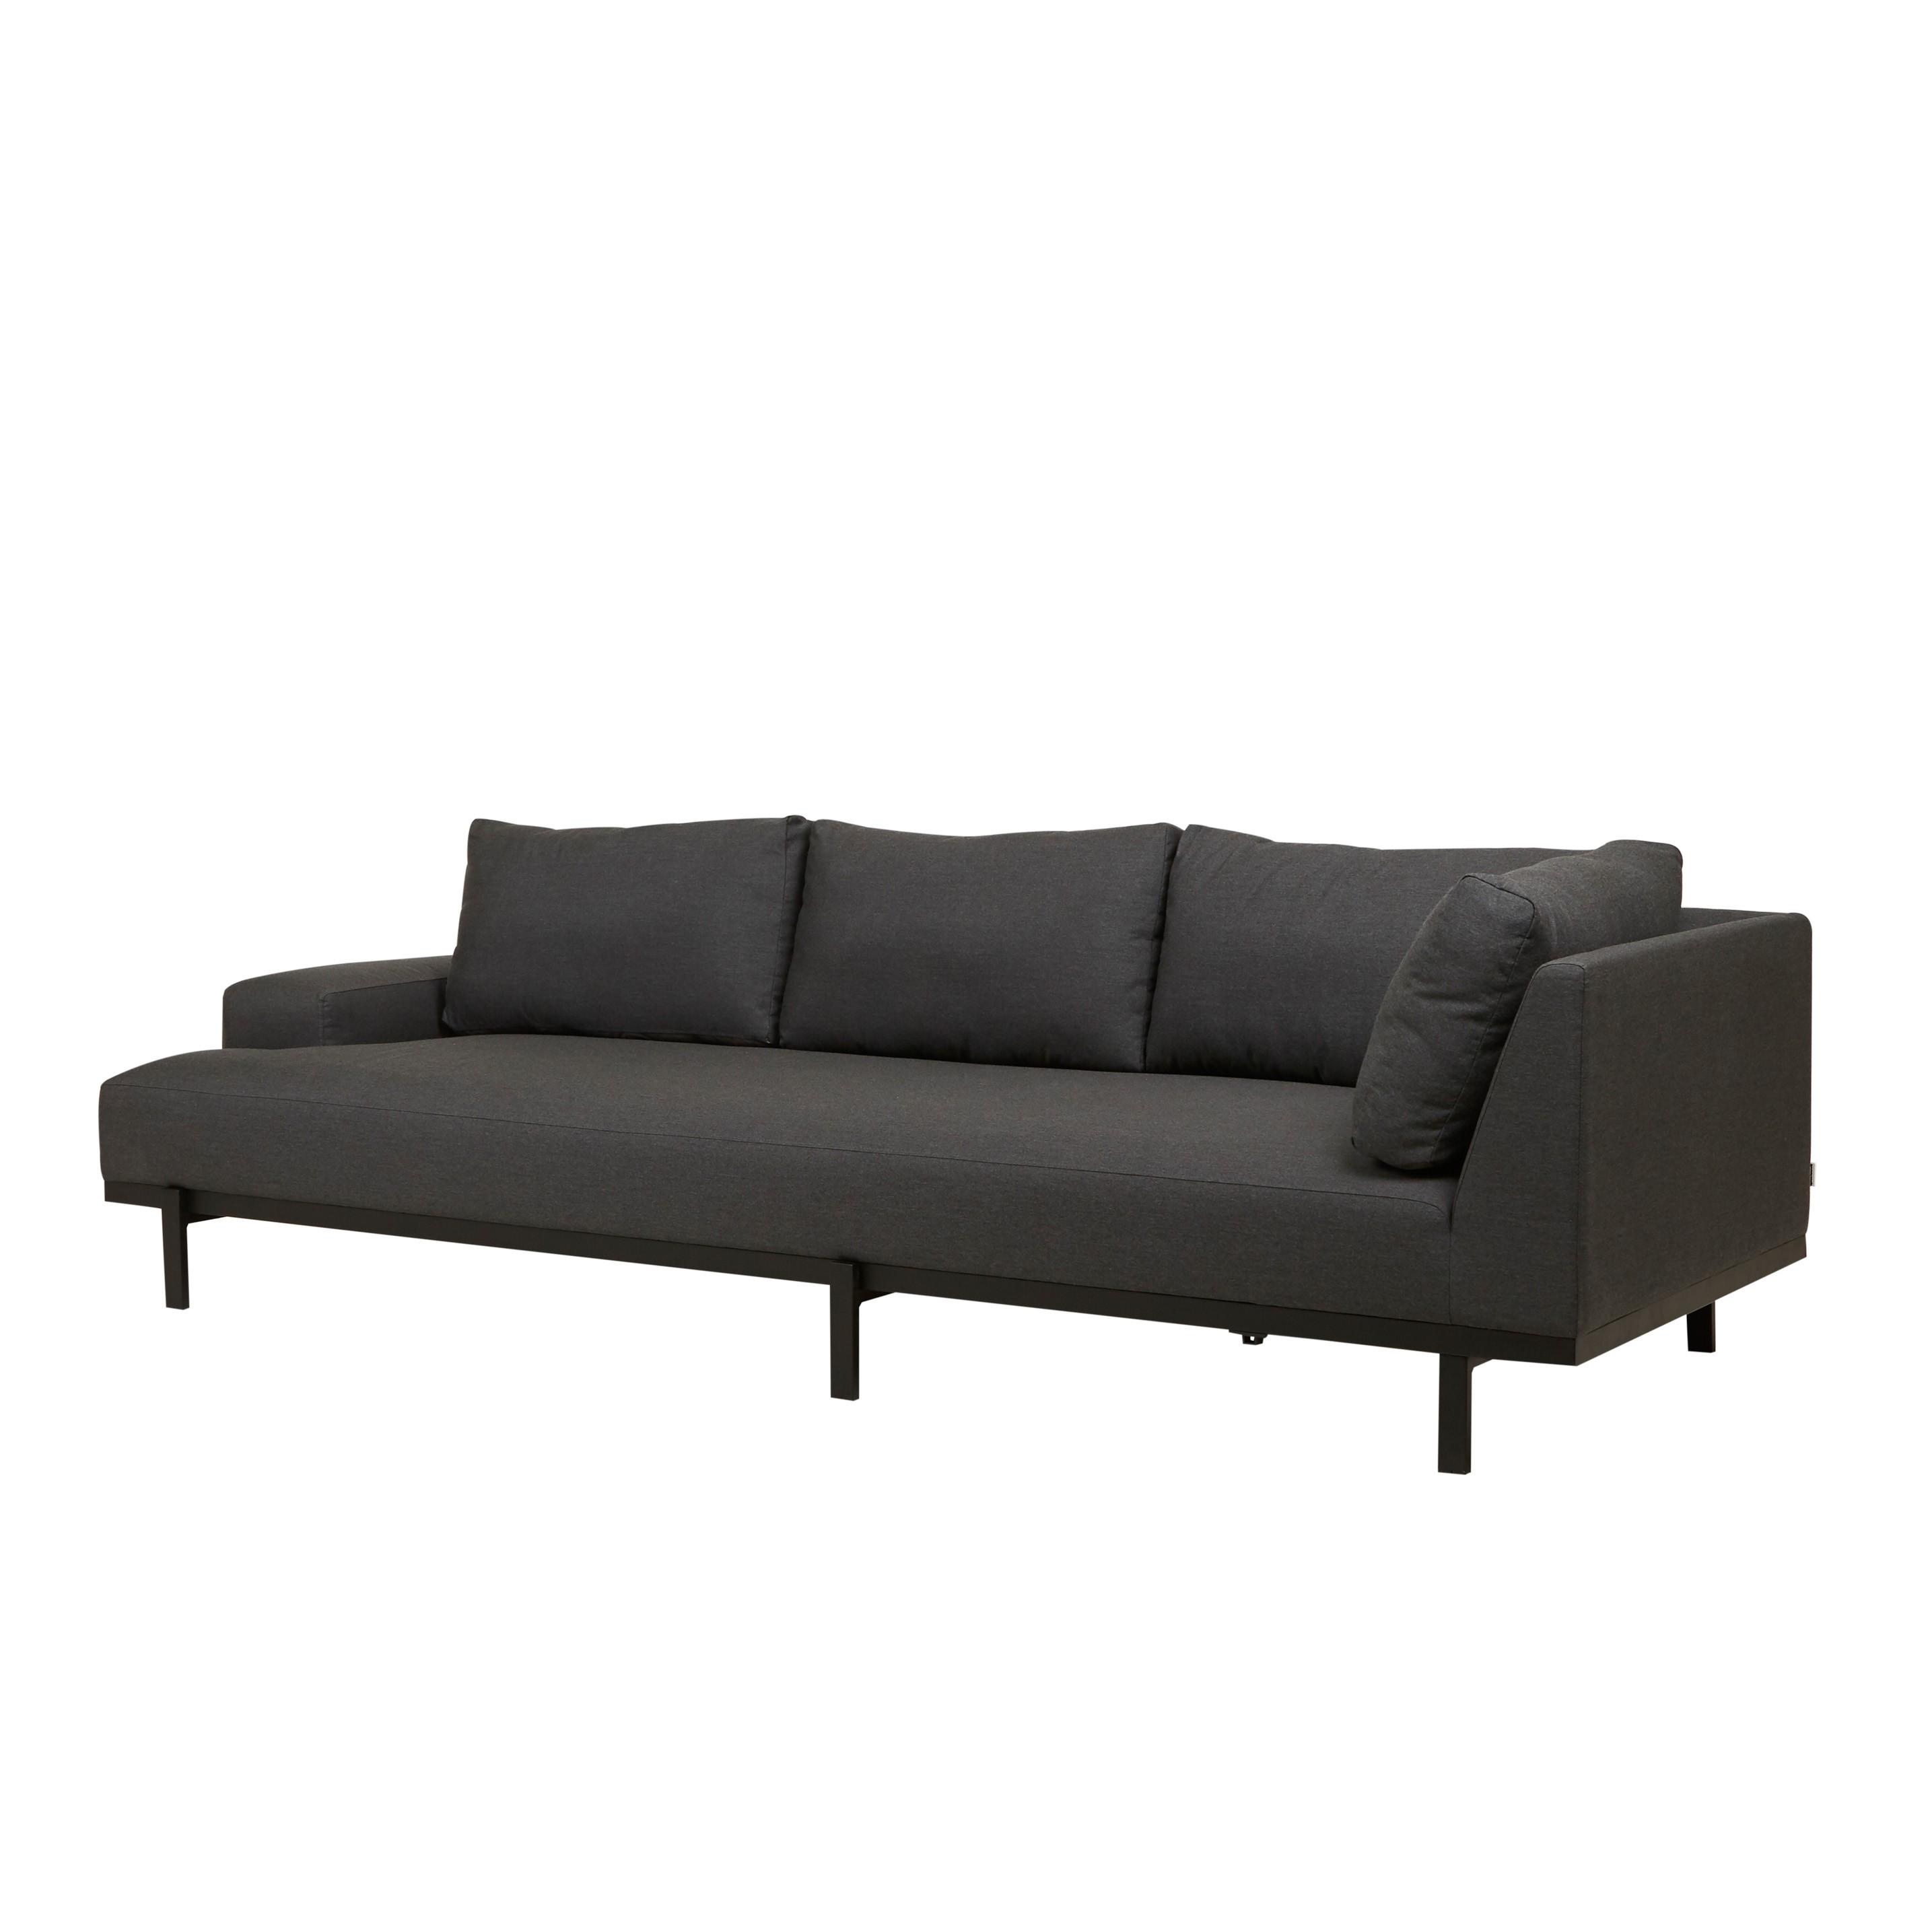 Furniture Hero-Images Sofas aruba-platform-left-chaise-01